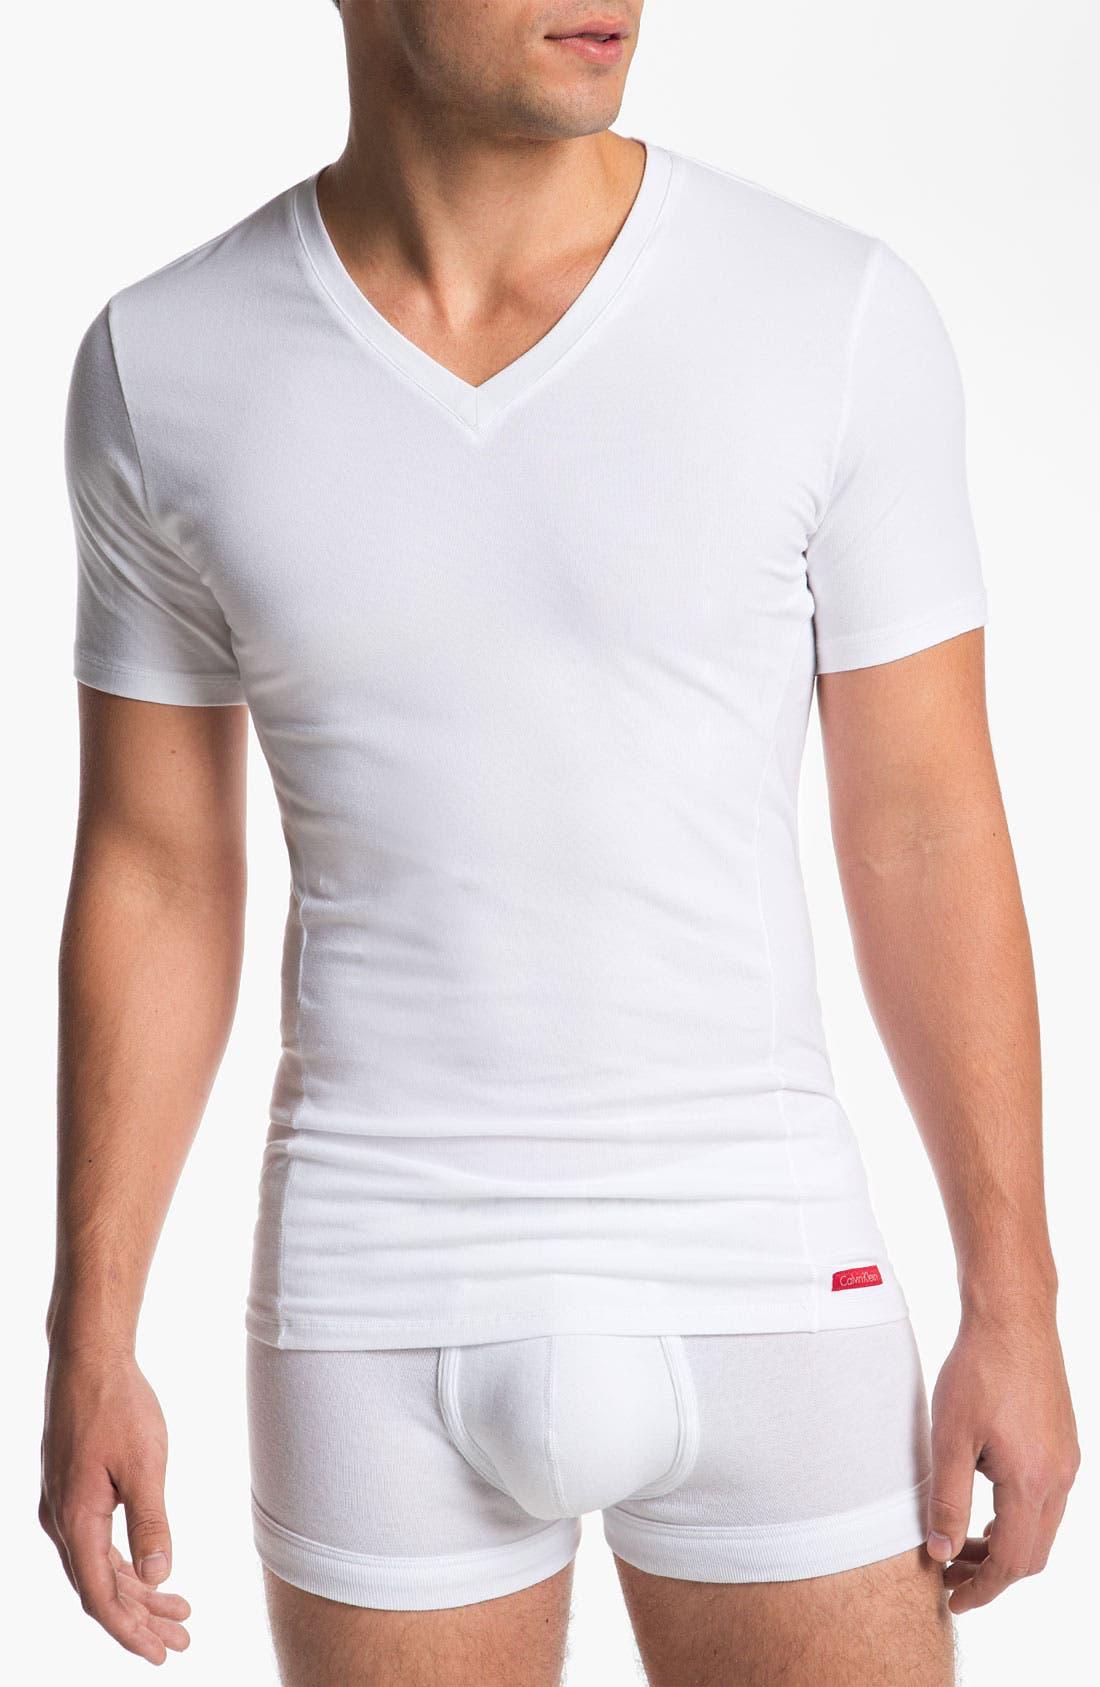 Alternate Image 1 Selected - Calvin Klein 'Pro Stretch' Slim Fit V-Neck T-Shirt